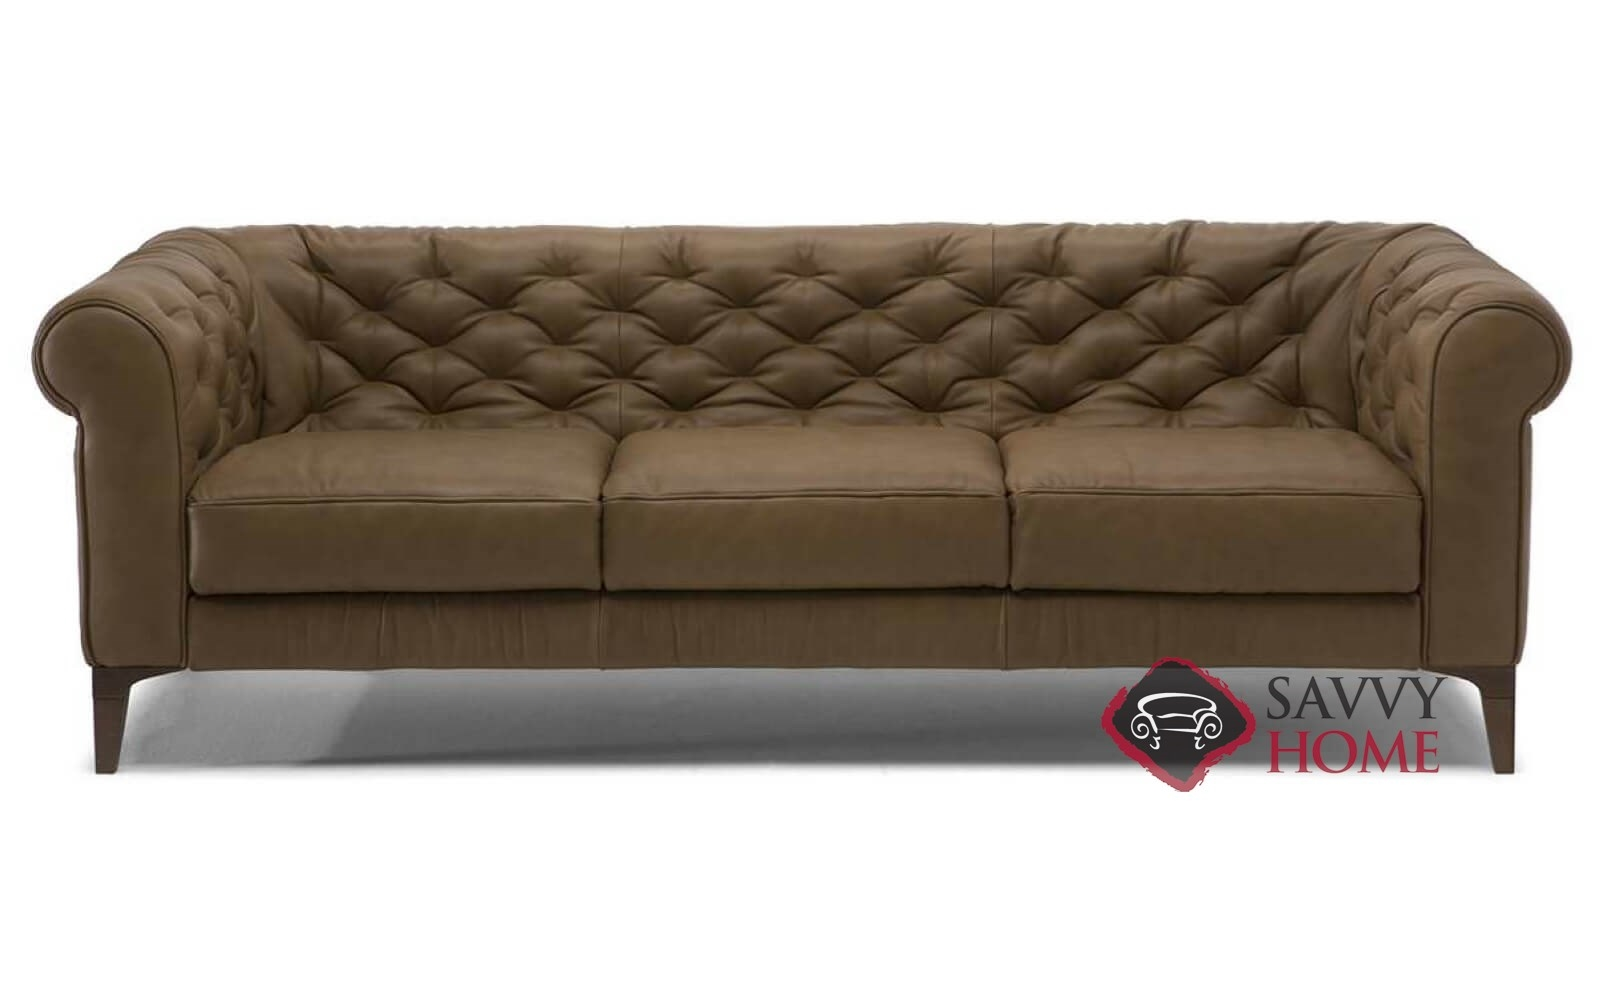 Taglia C005 Leather Stationary Sofa By Natuzzi Is Fully